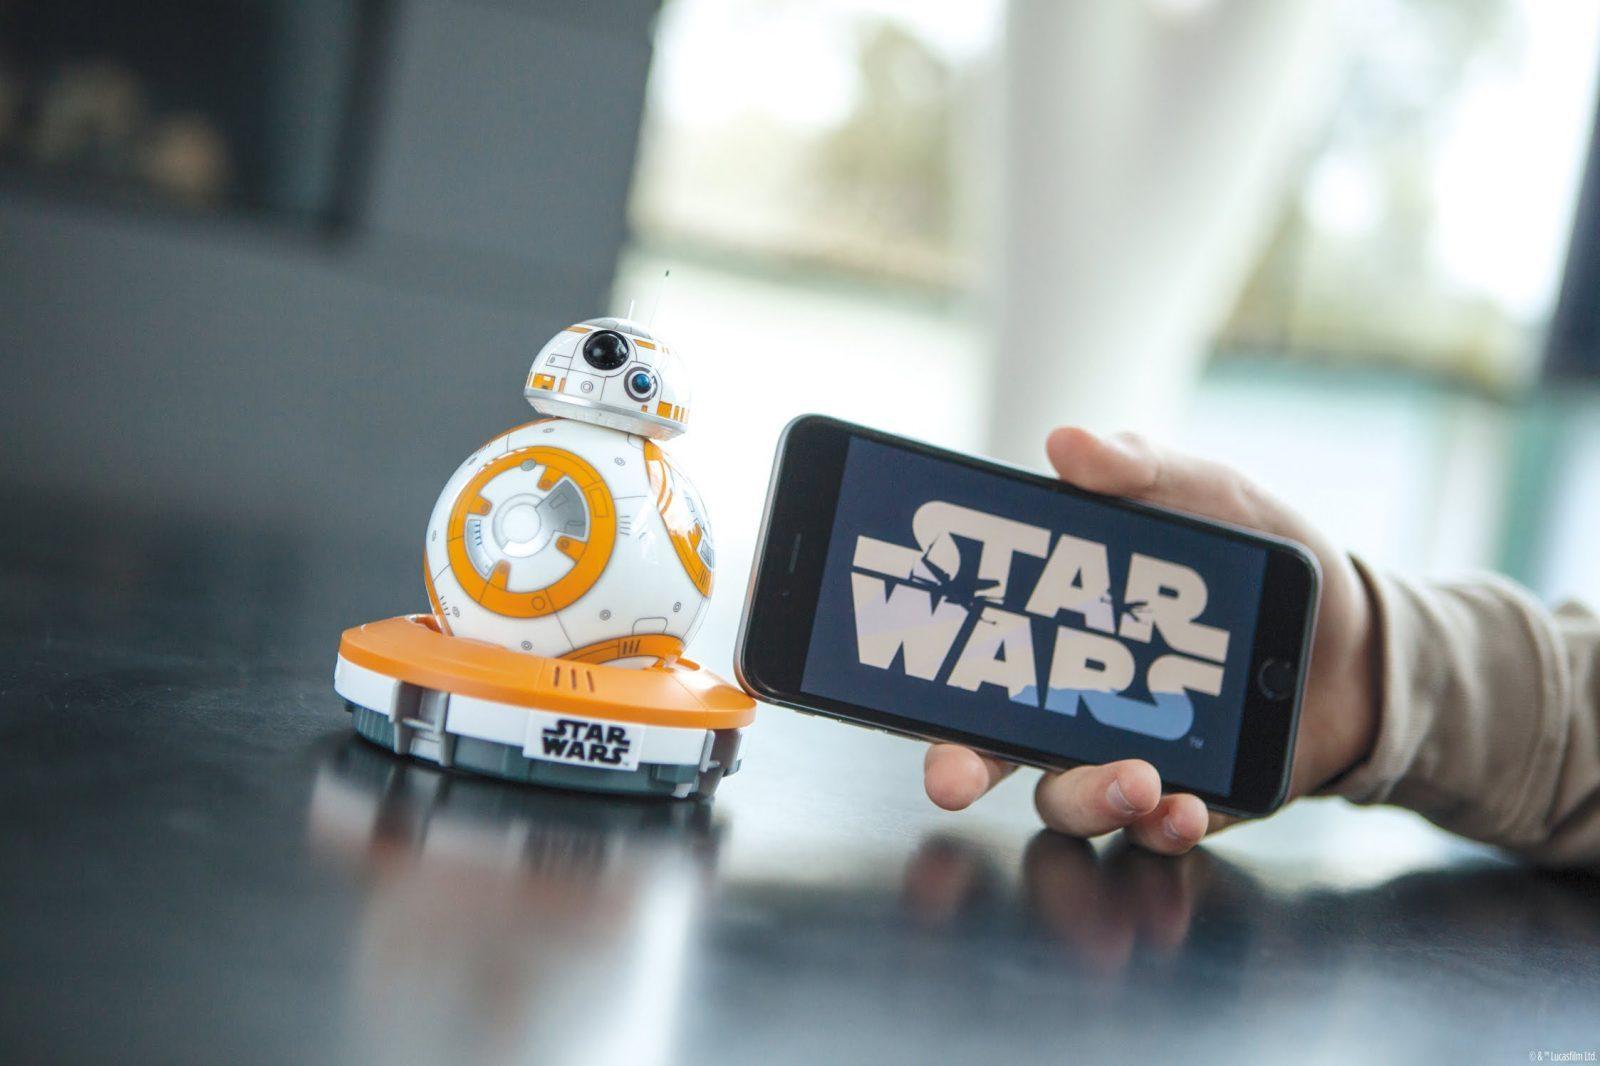 [Coding] Sphero 新機器人 BB-8 : 一小時之內賣光